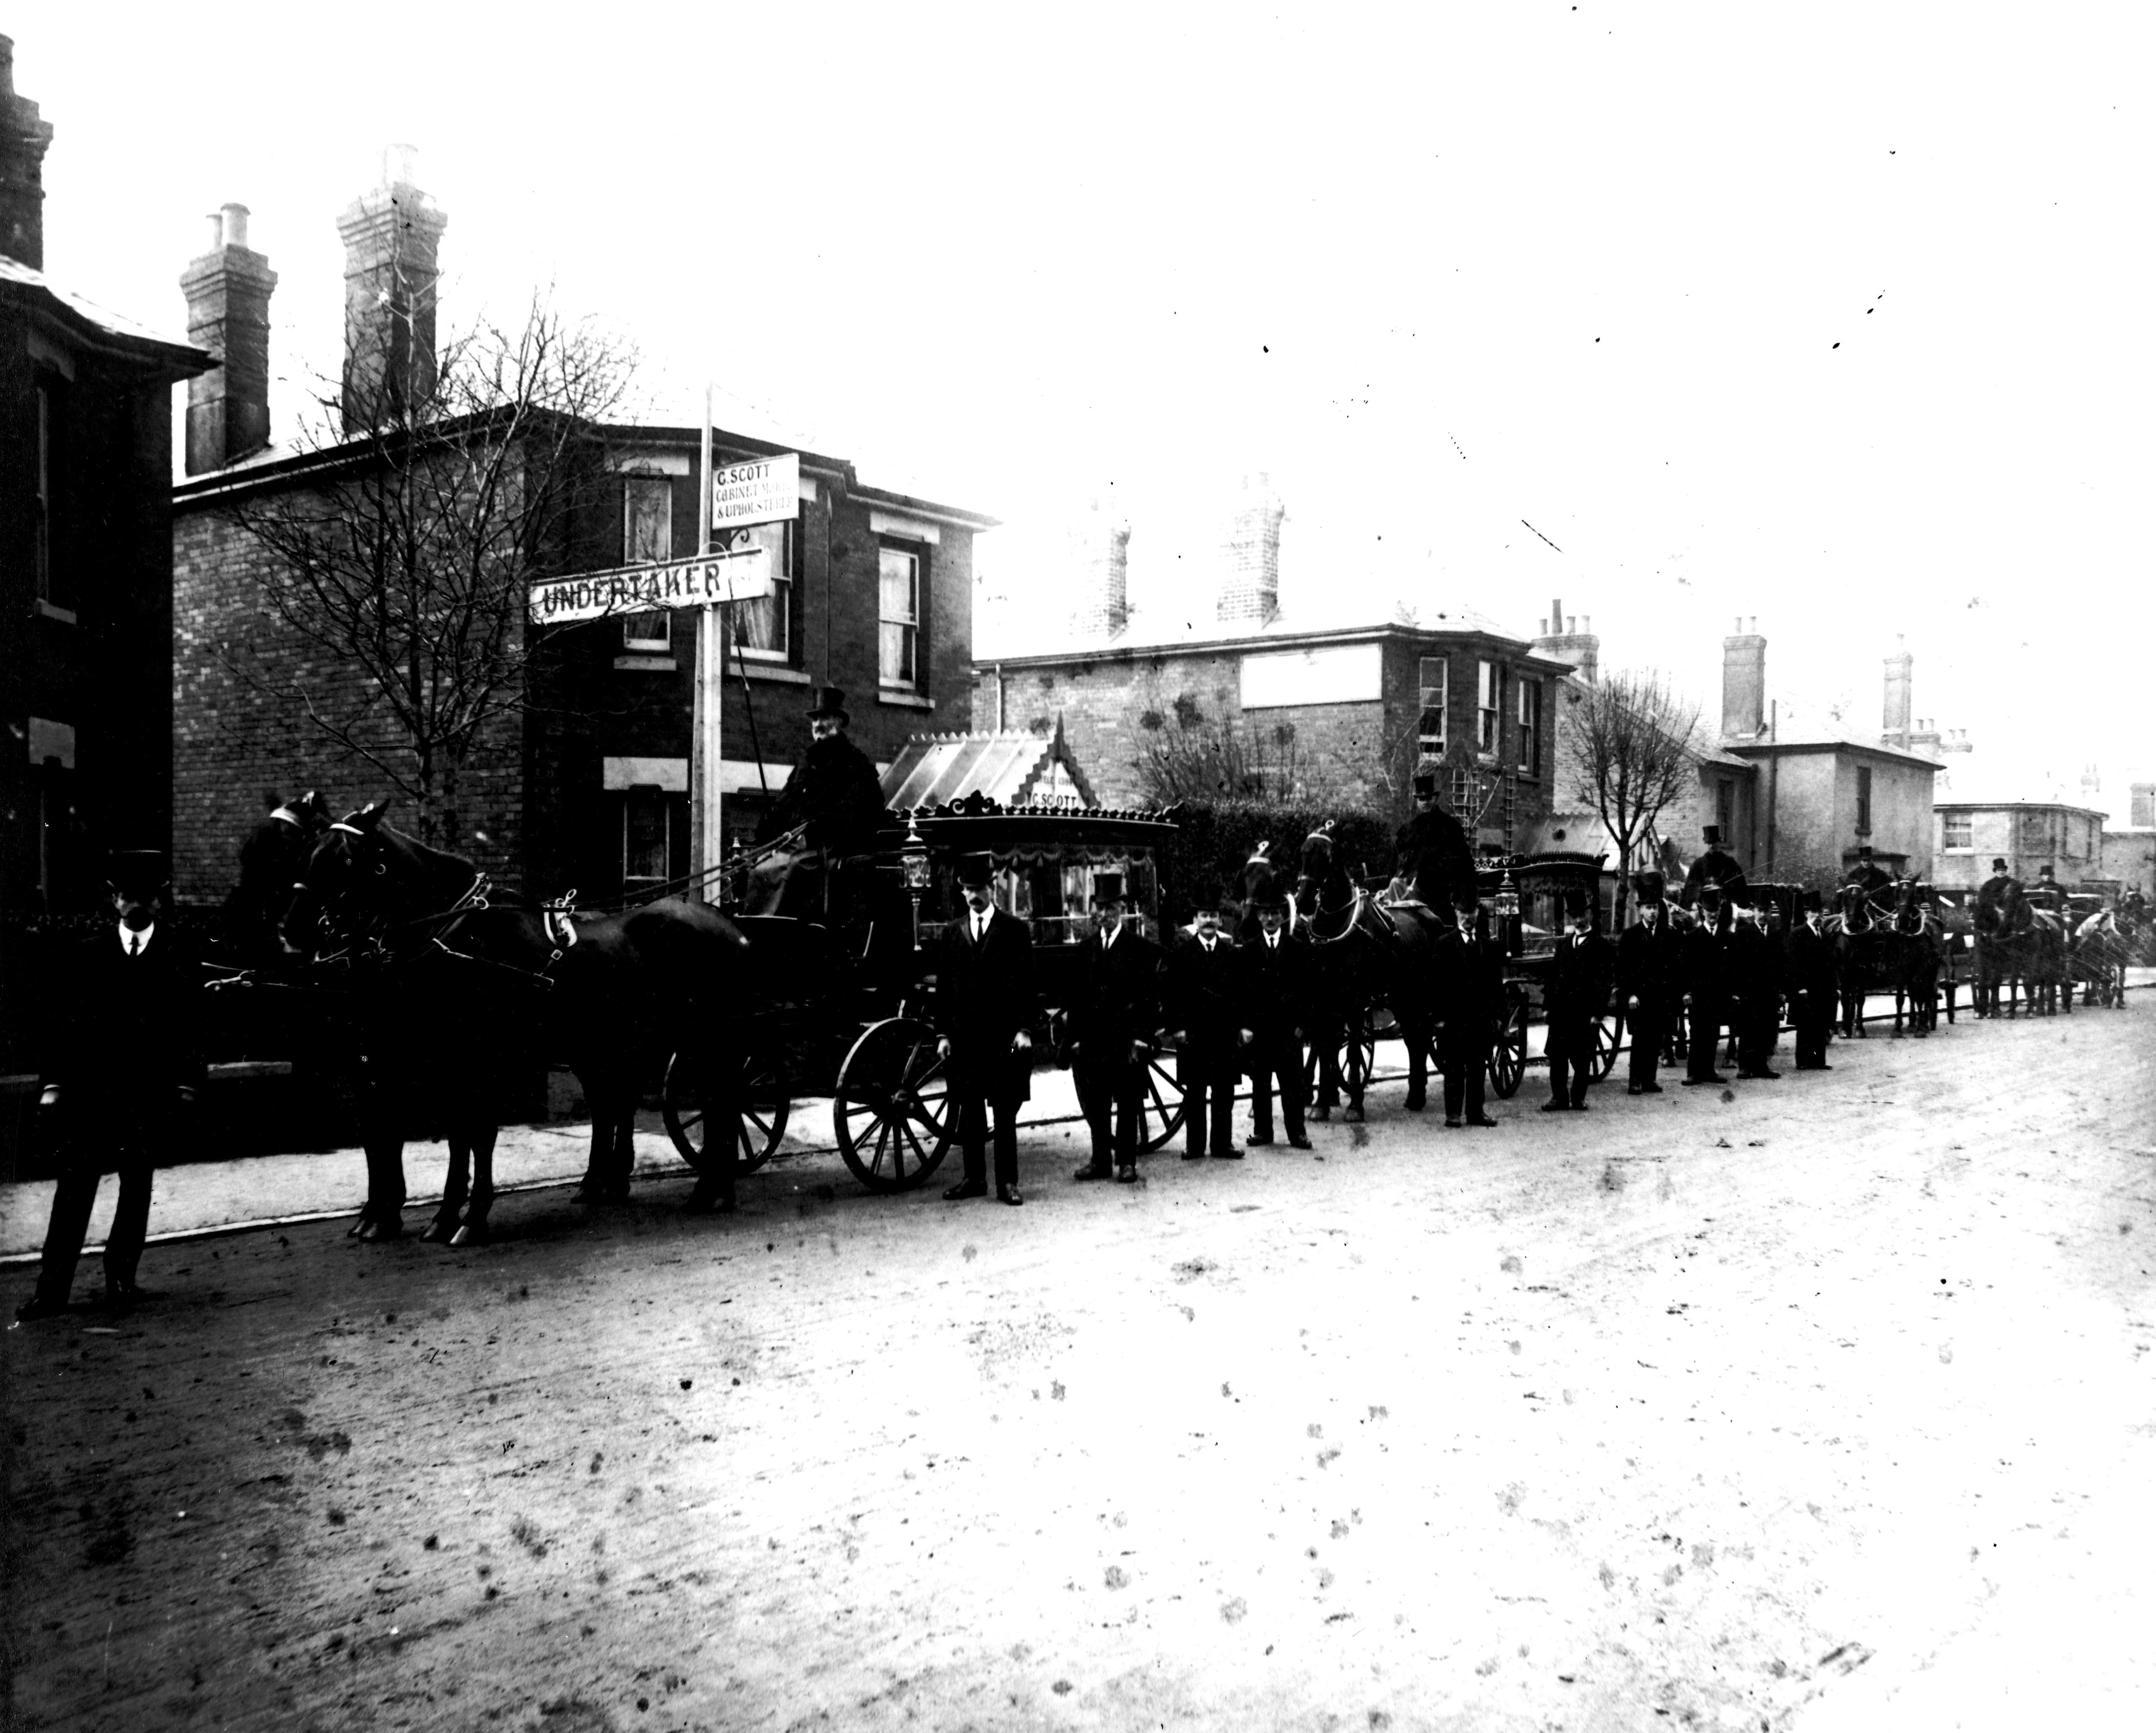 George Scott Funeral Directors - a historic image